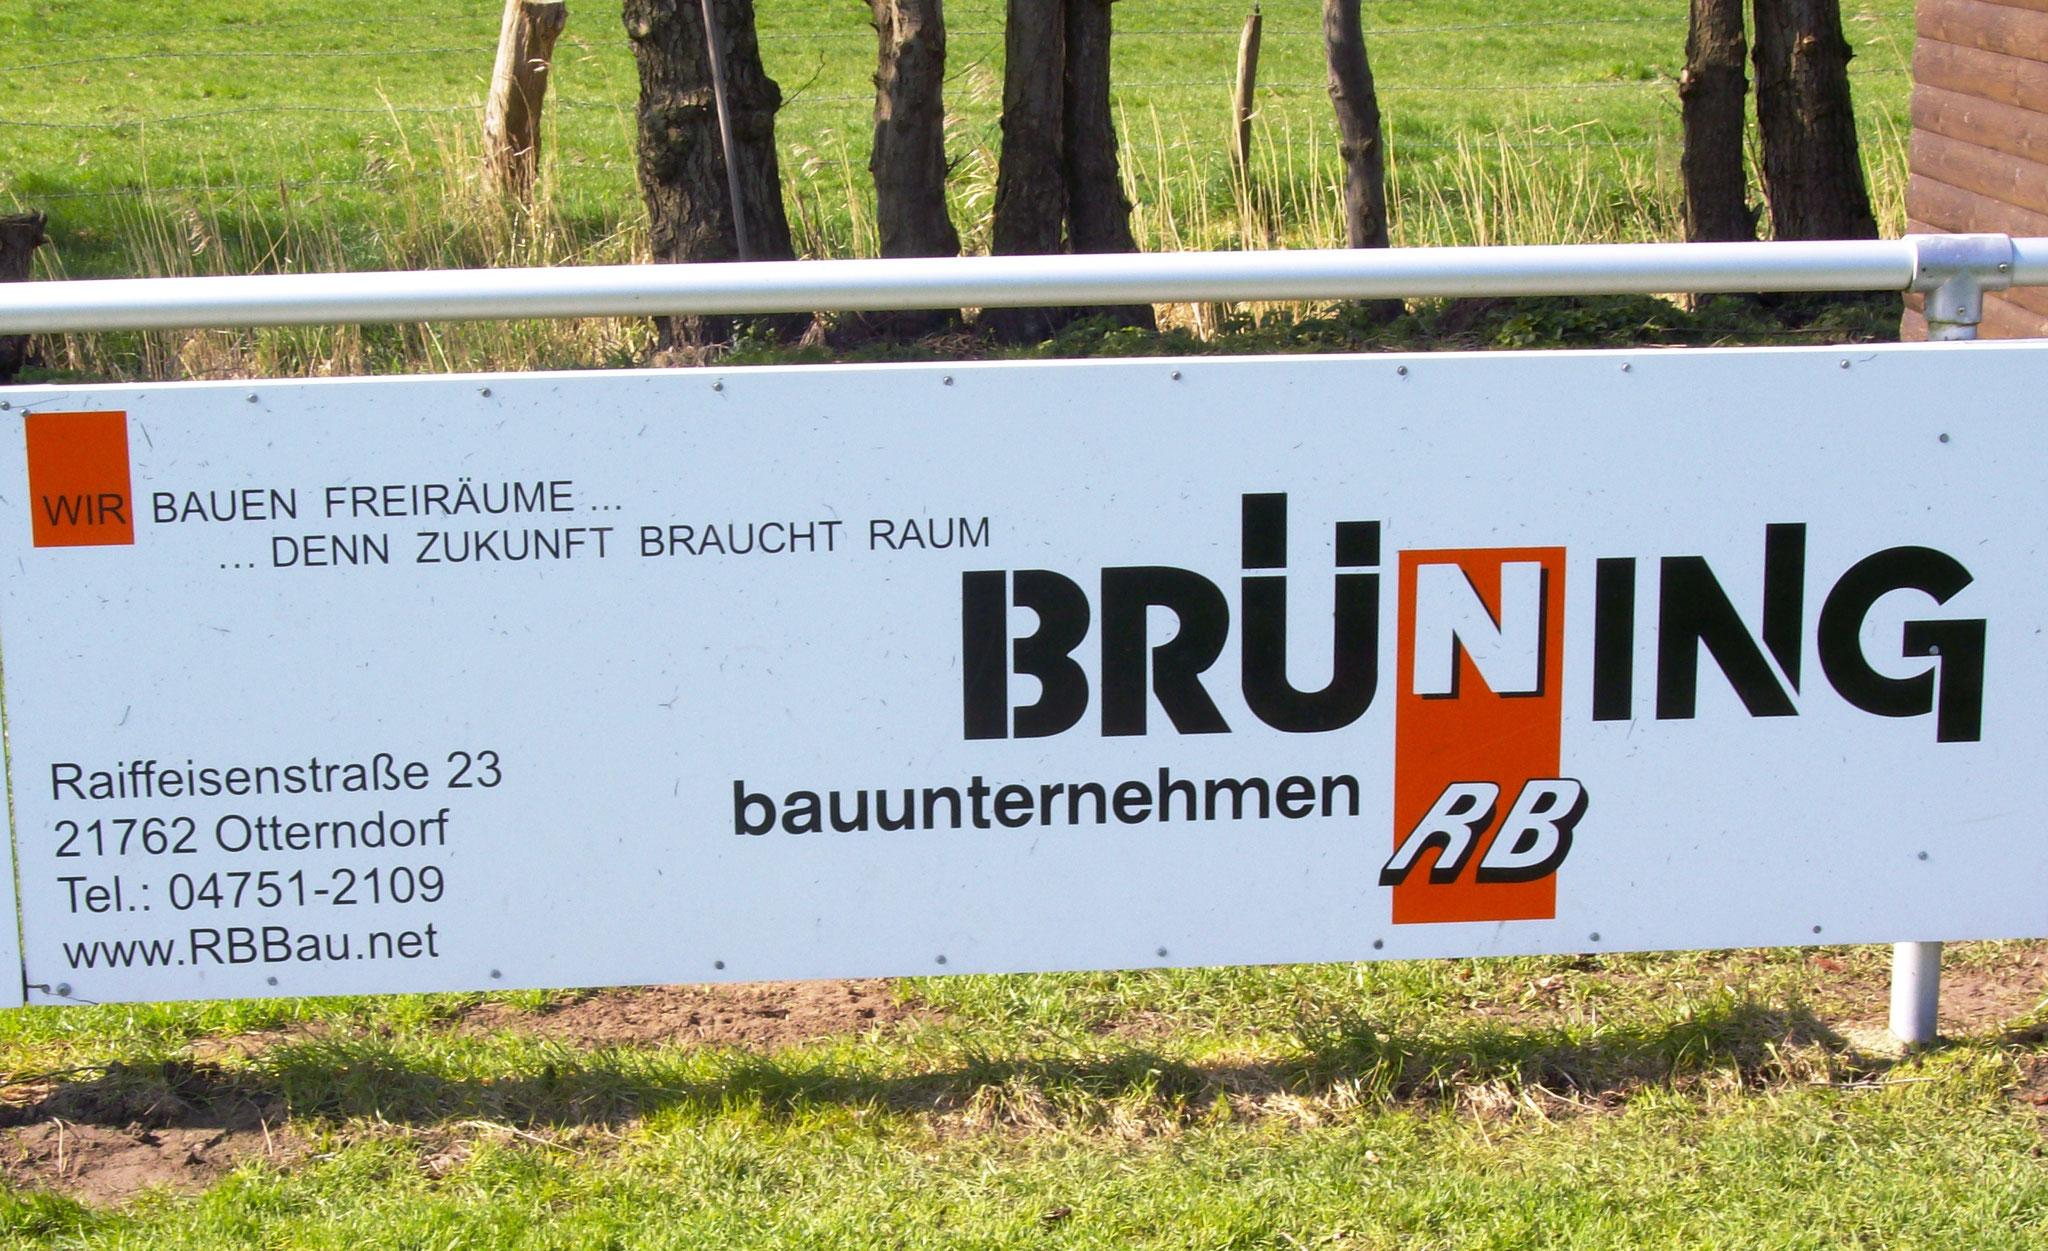 Bauunternehmen  Brüning